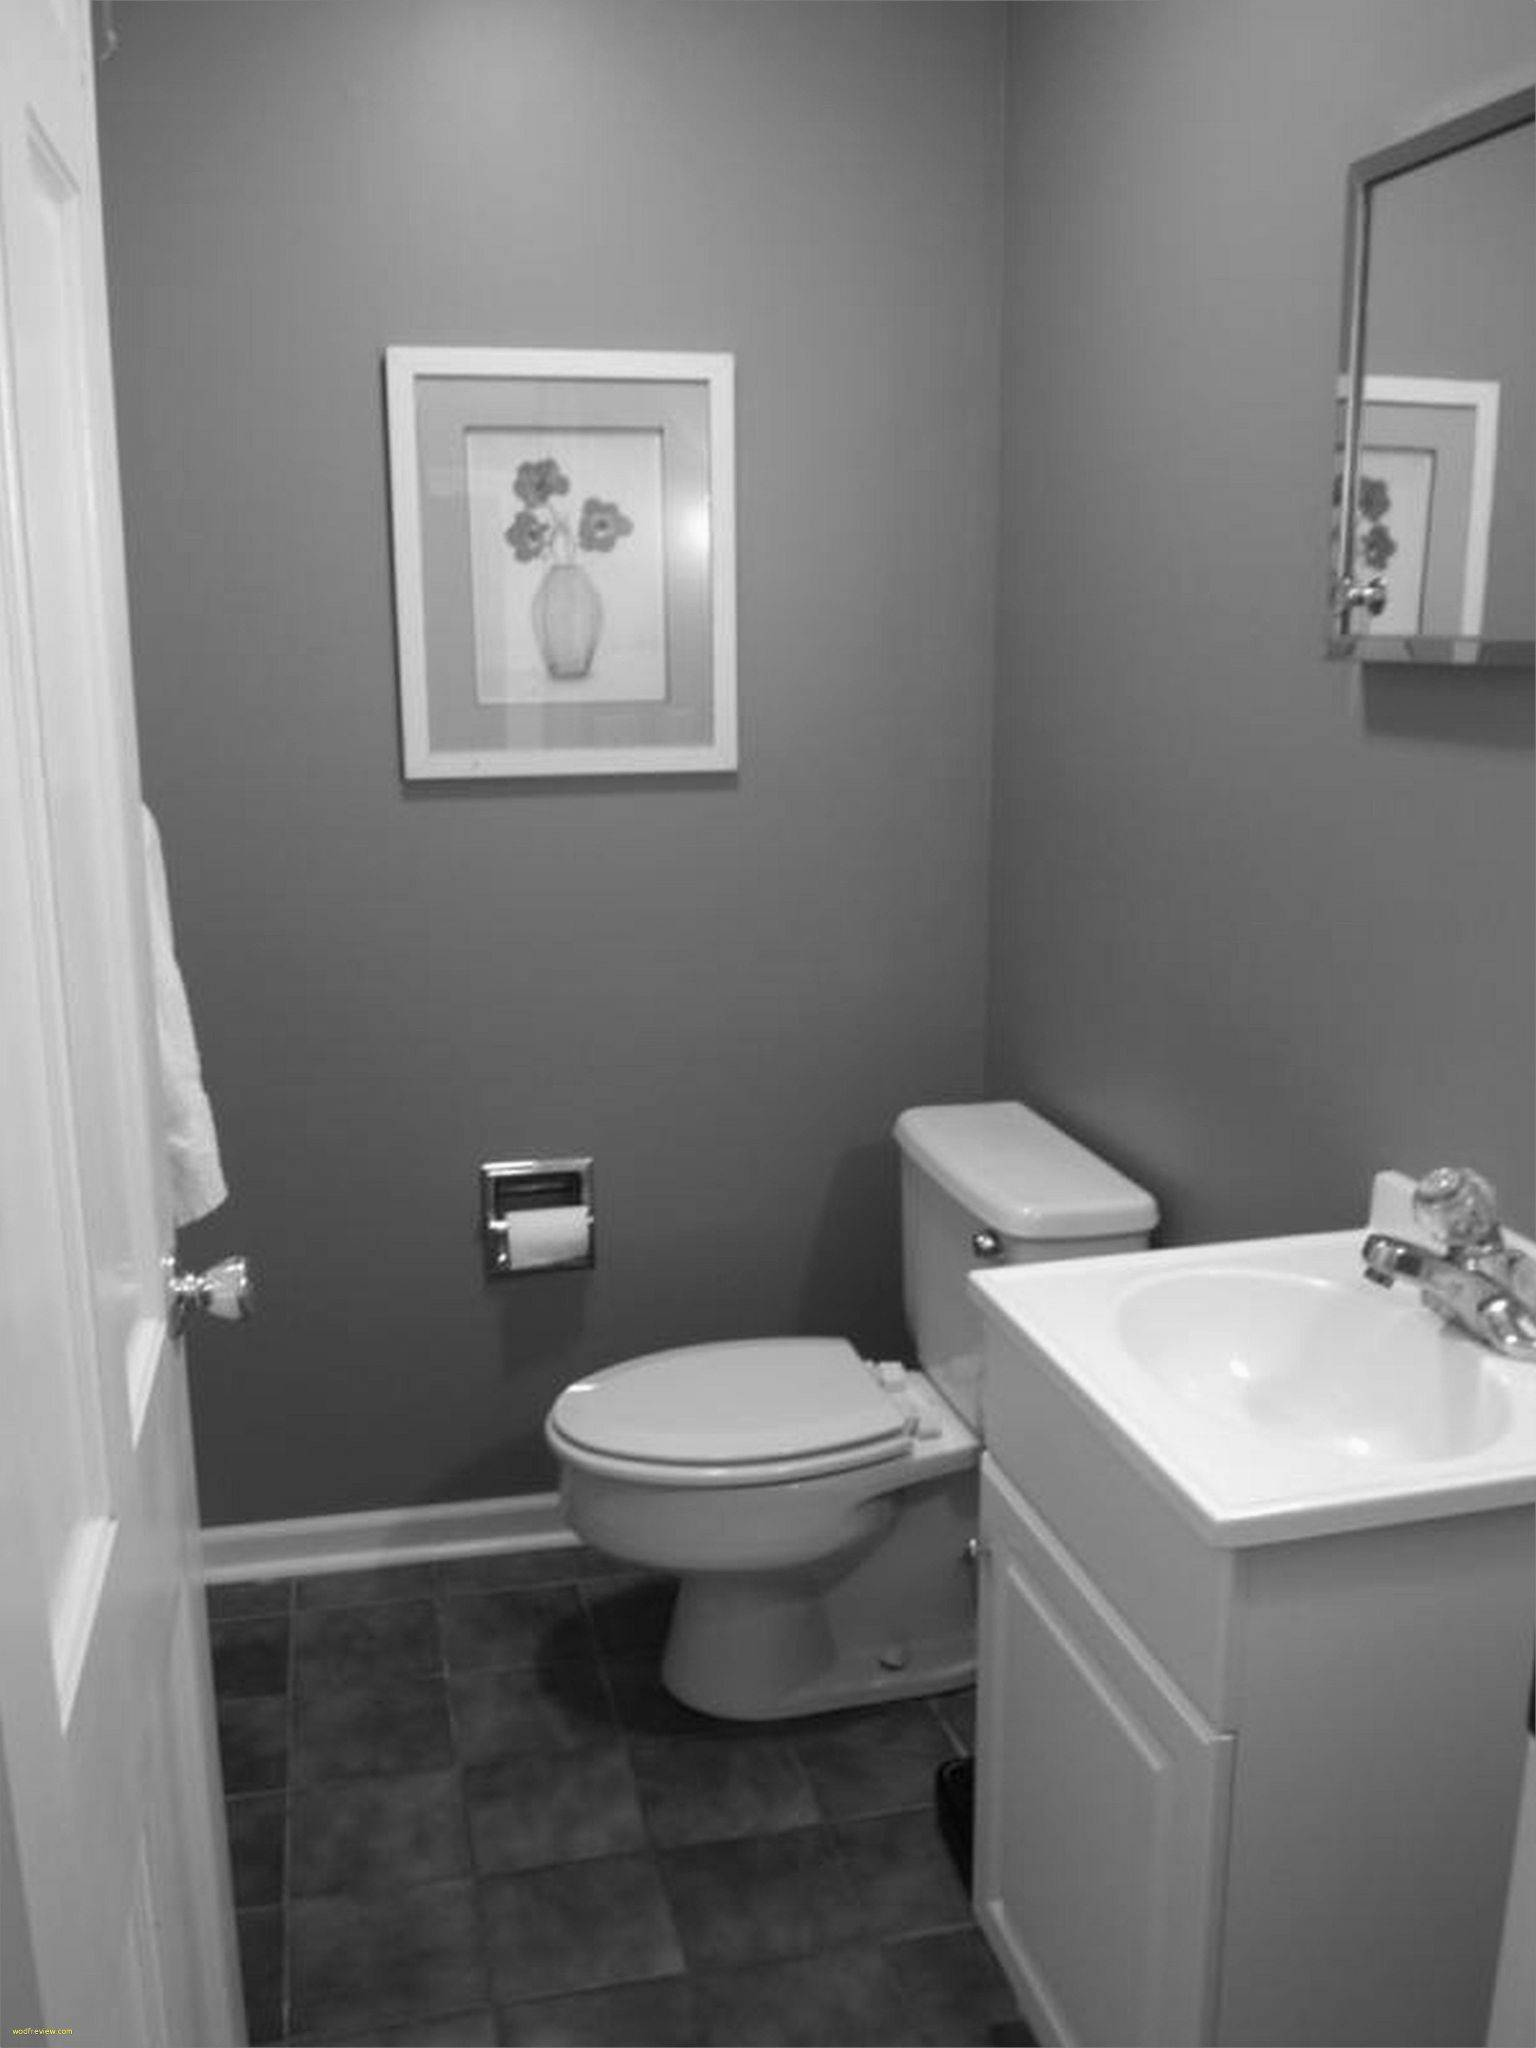 modern home interior design bathroom elegant bathroom style ideas of modern home interior design bathroom